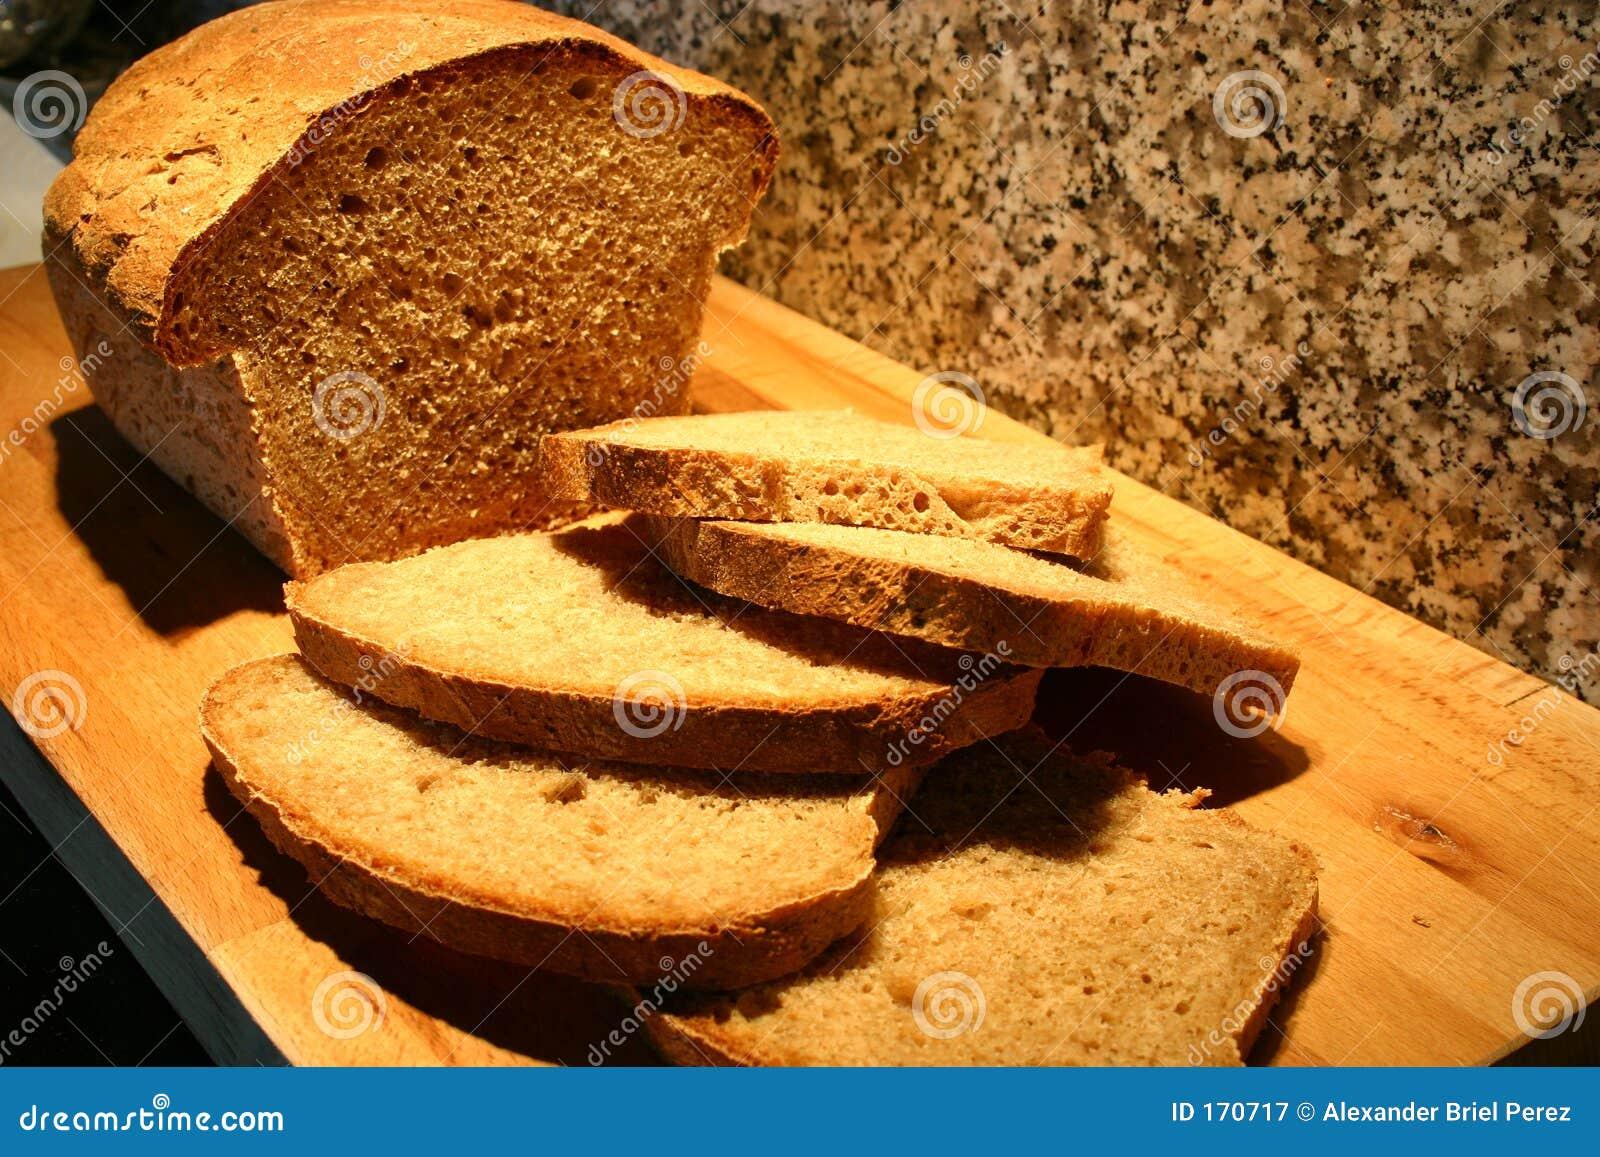 Cutted的面包